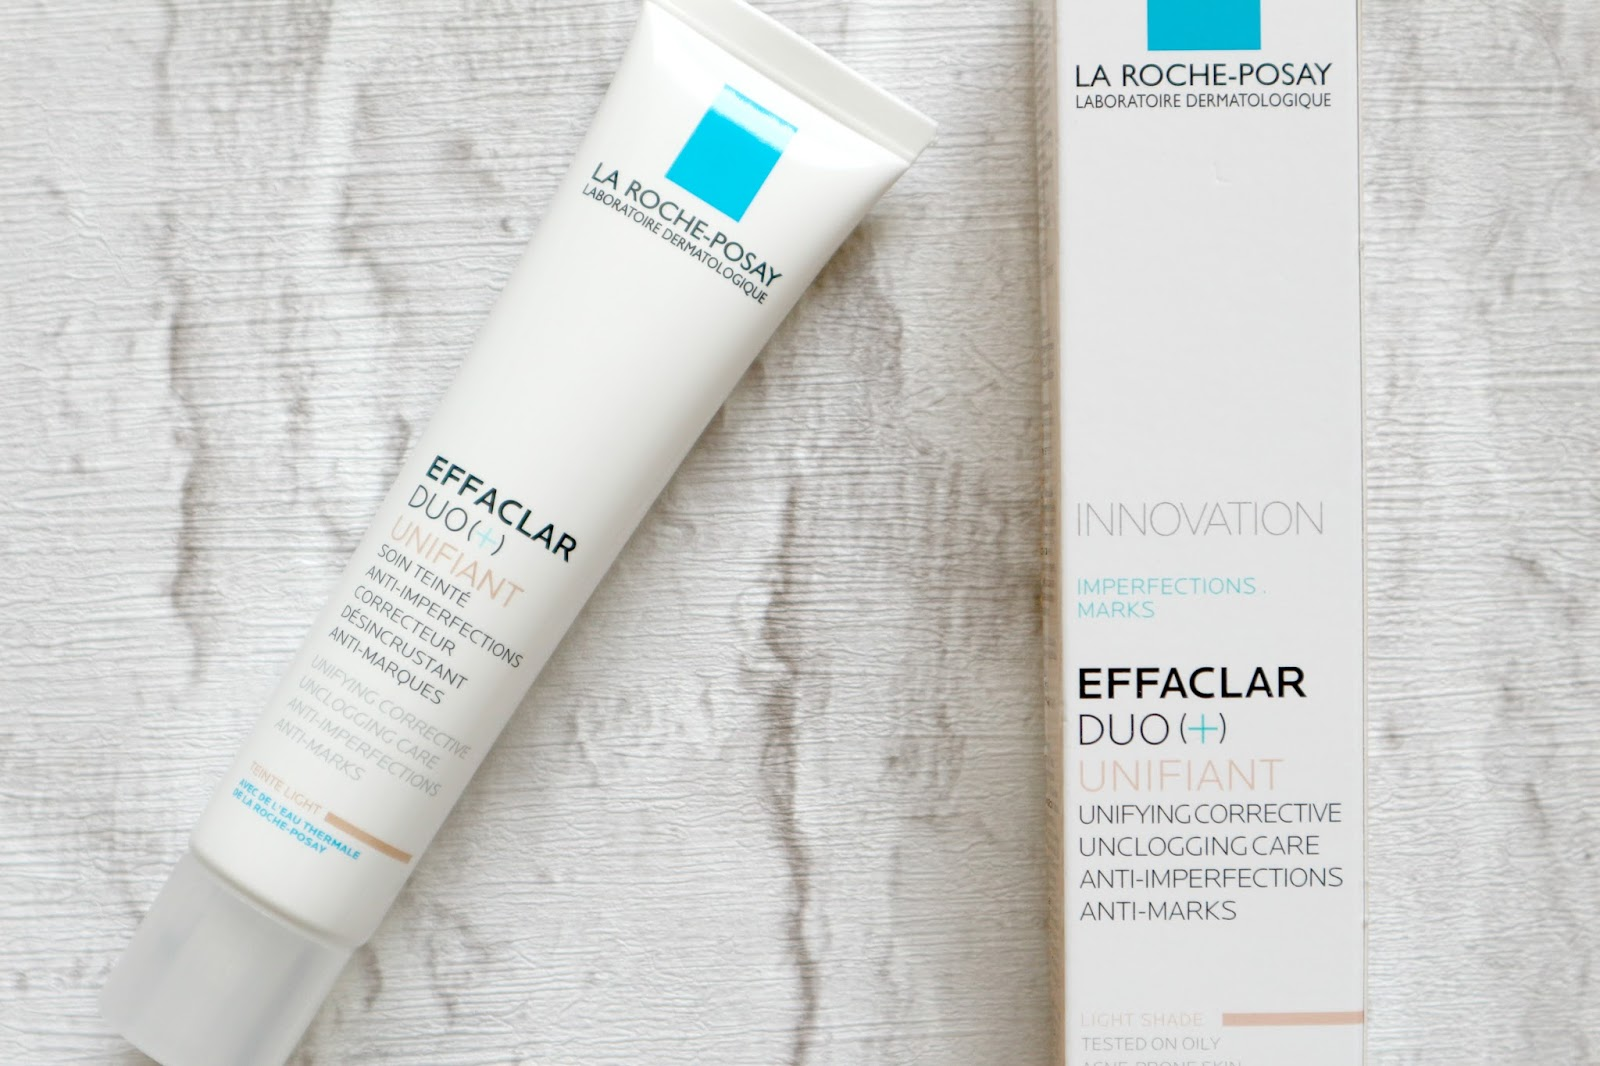 La Roche Posay Effaclar Duo Plus Unifiant